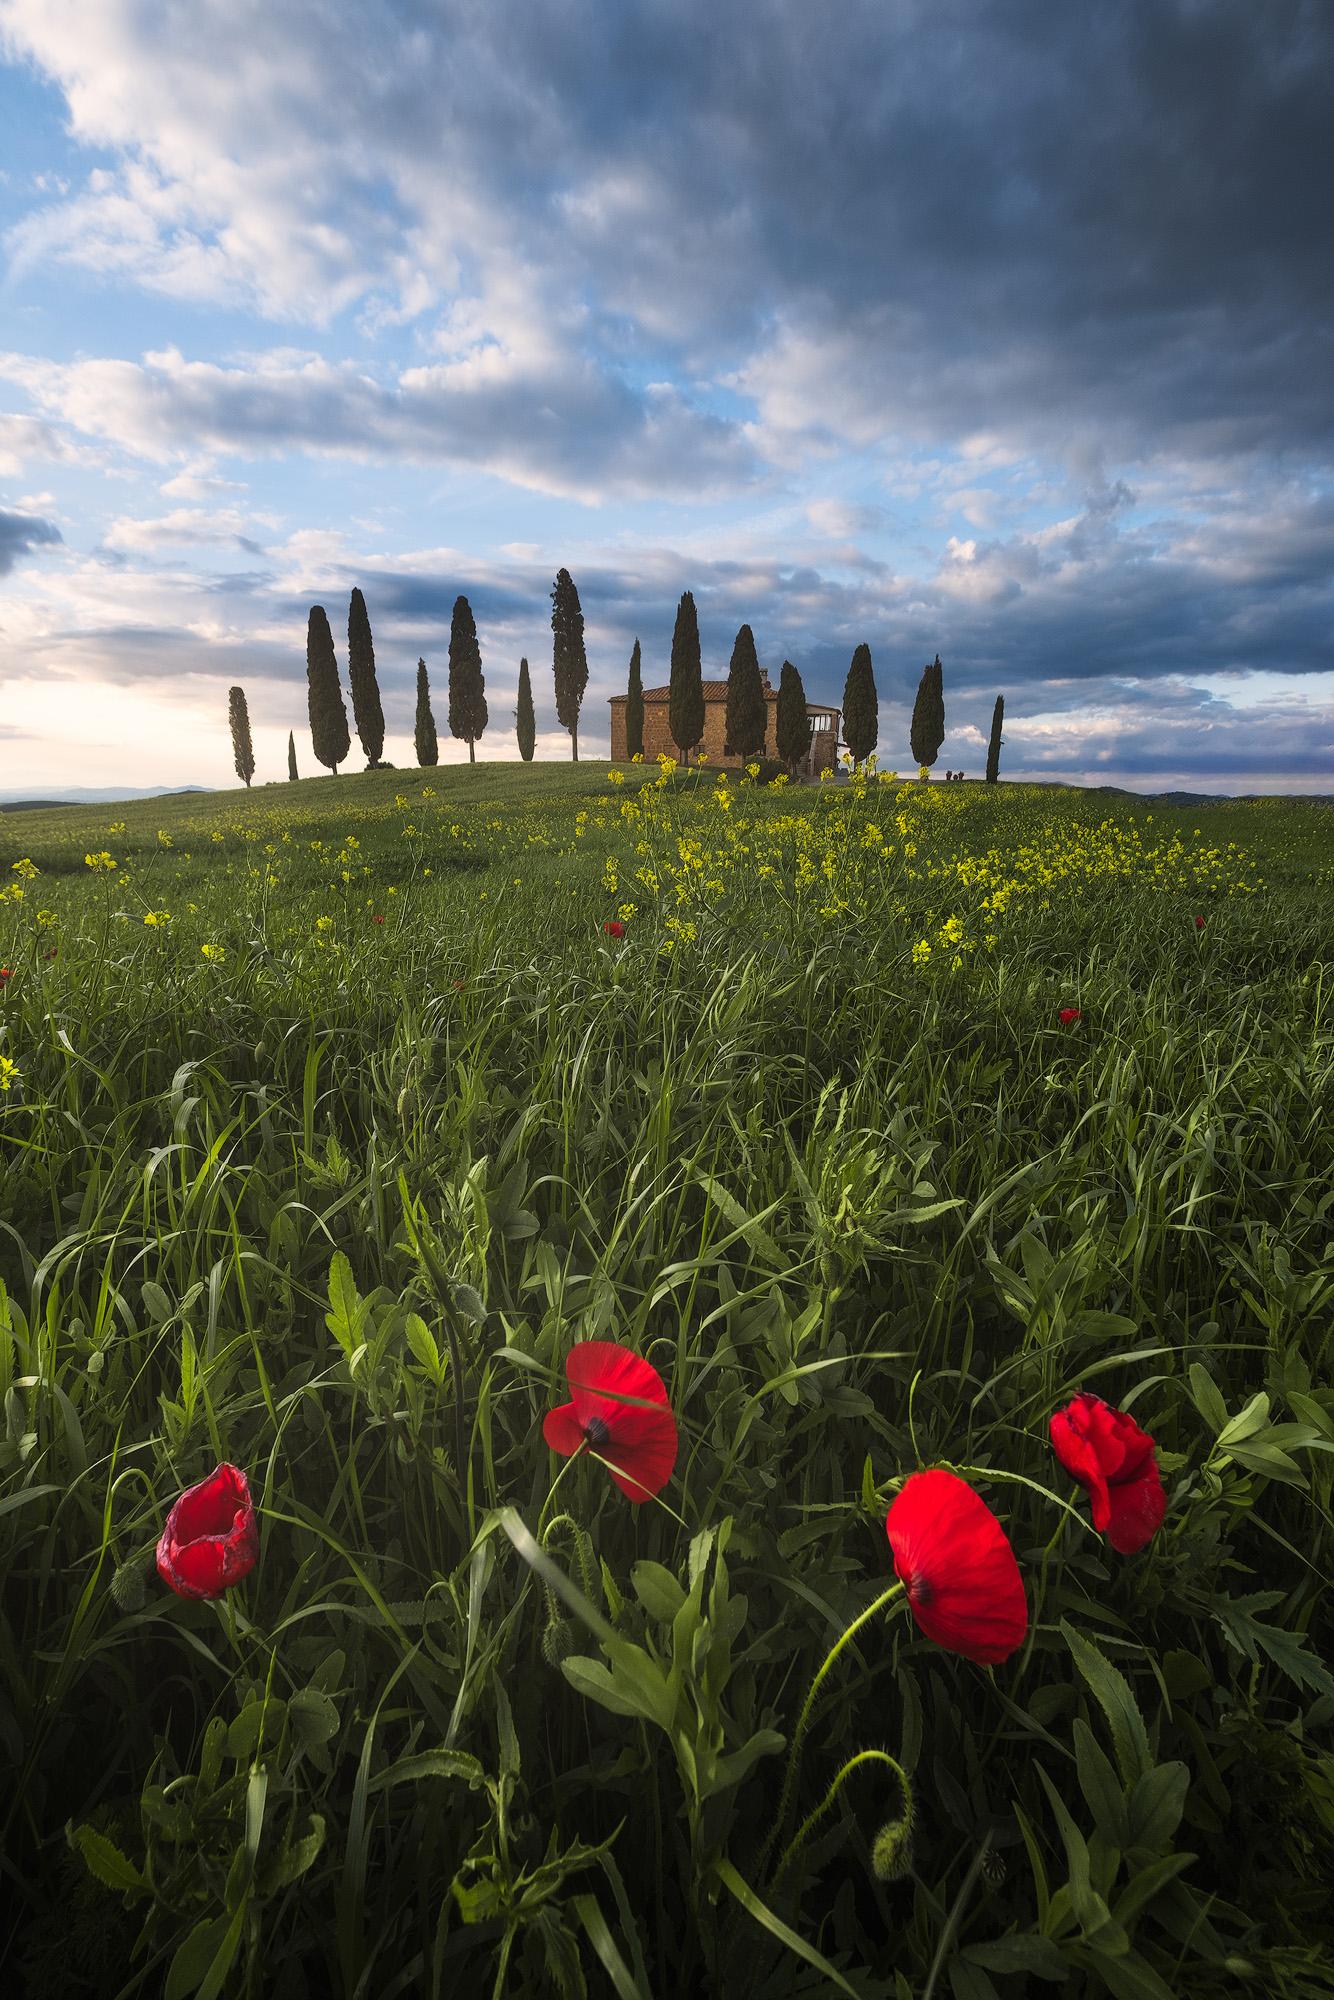 Pienza Poppies   Poppies in a field near Pienza, in San Quirico d'Orcia